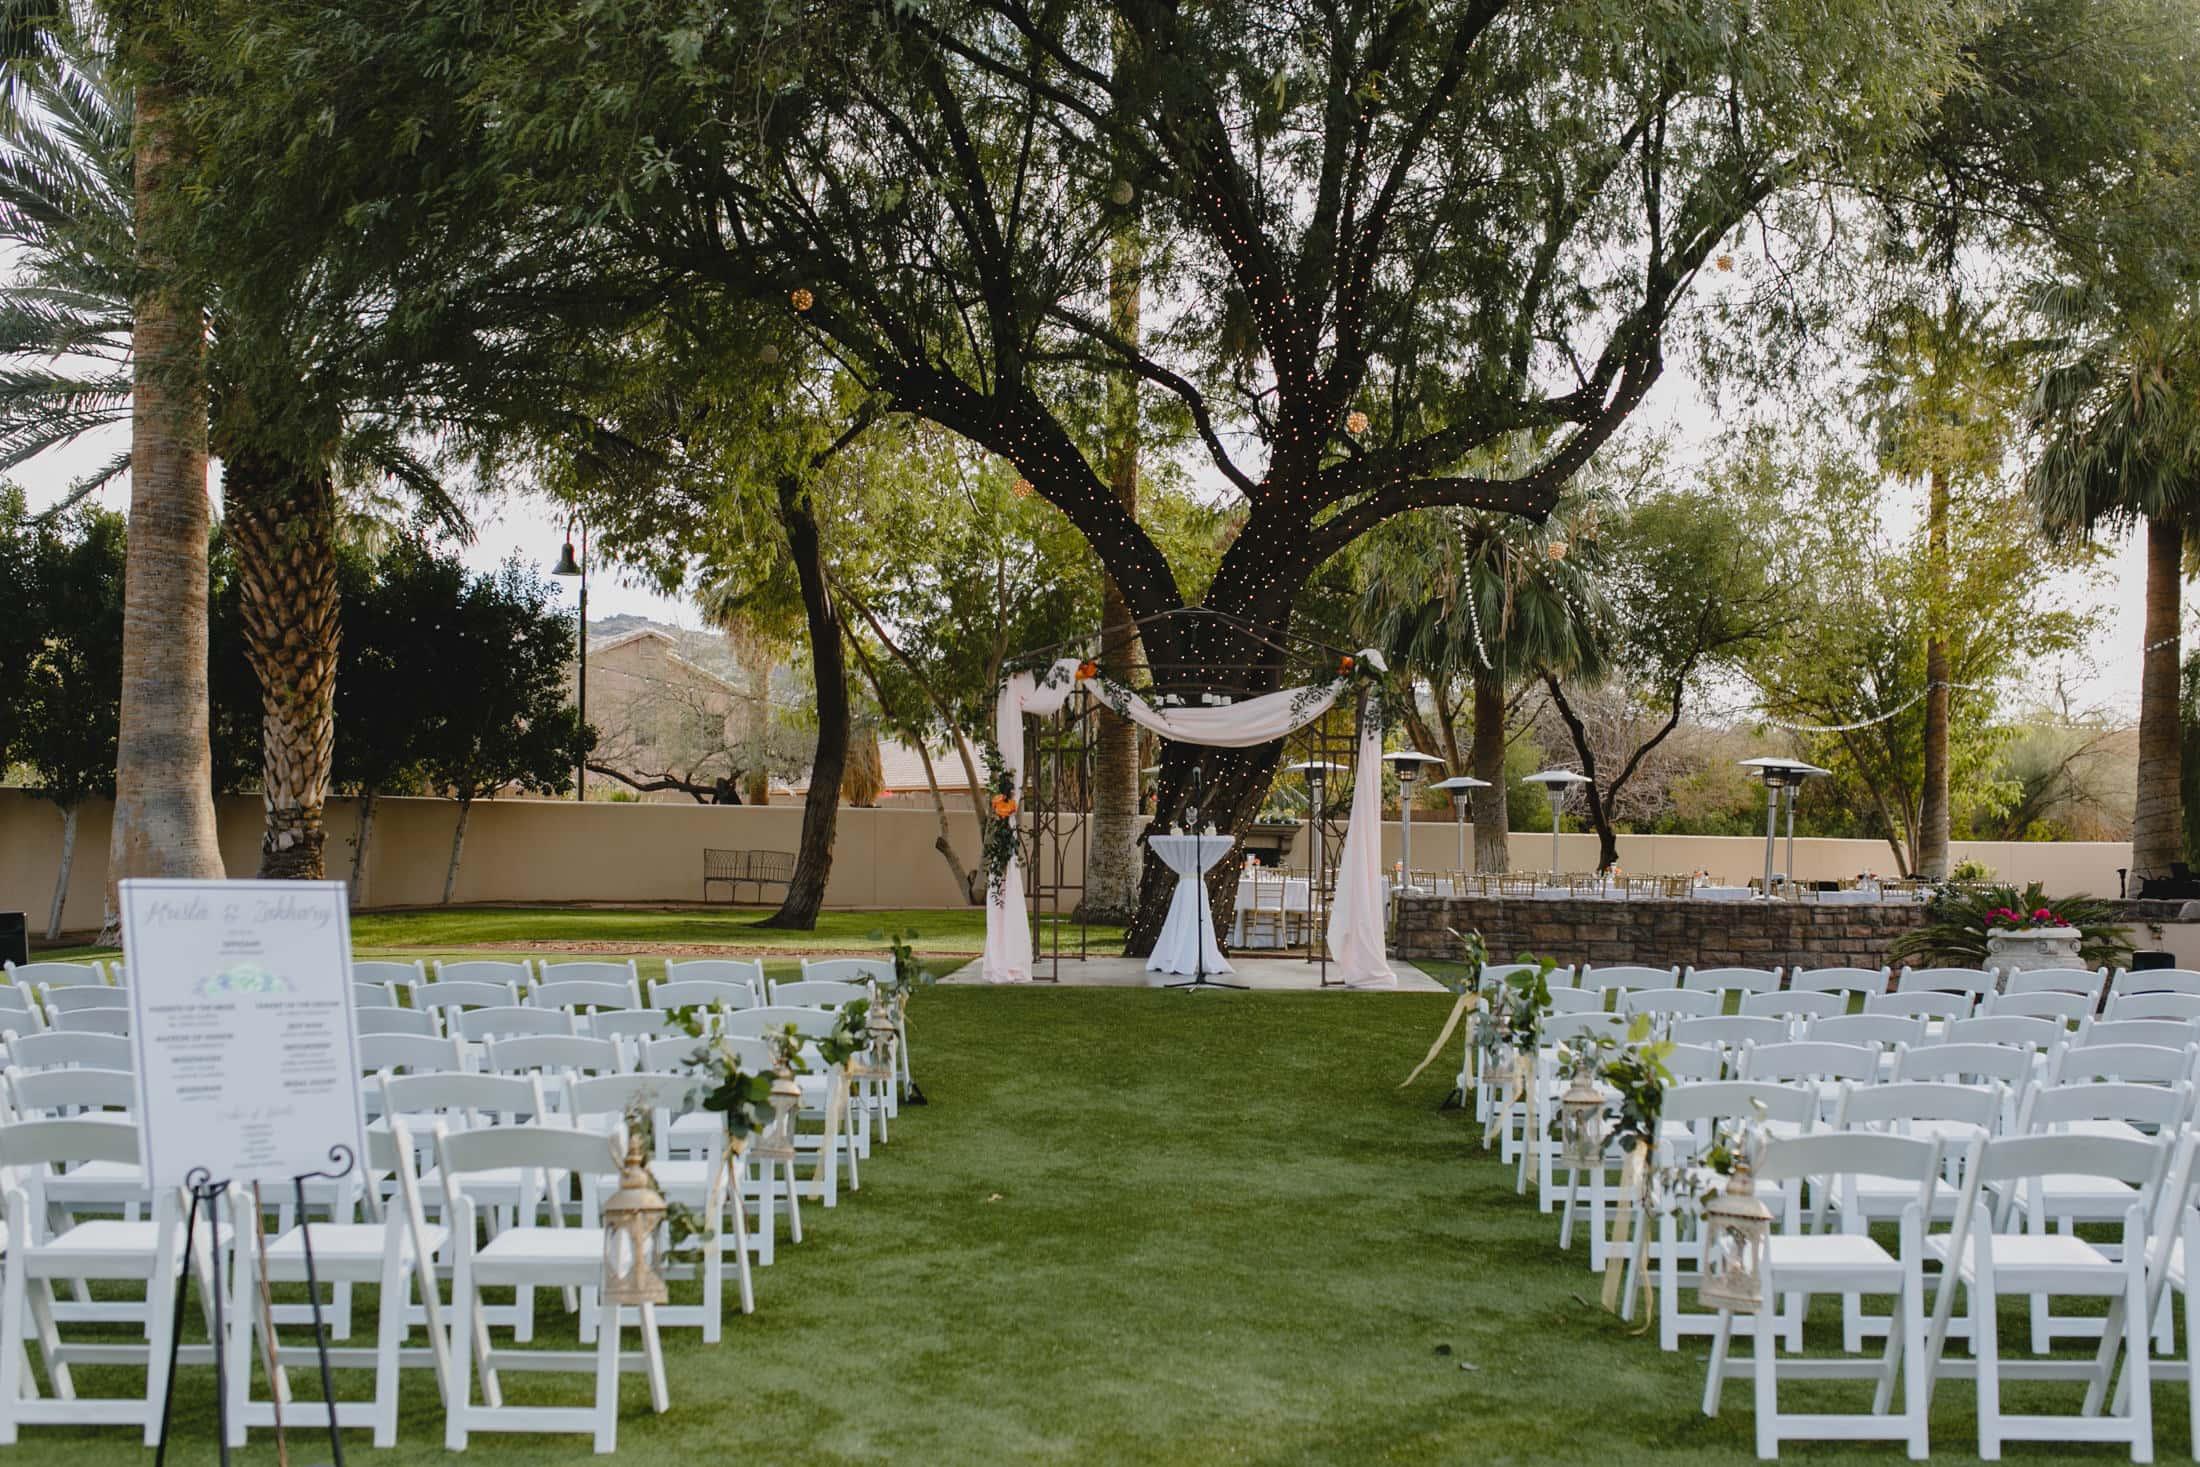 Secret Garden Arizona wedding ceremony space with large trees